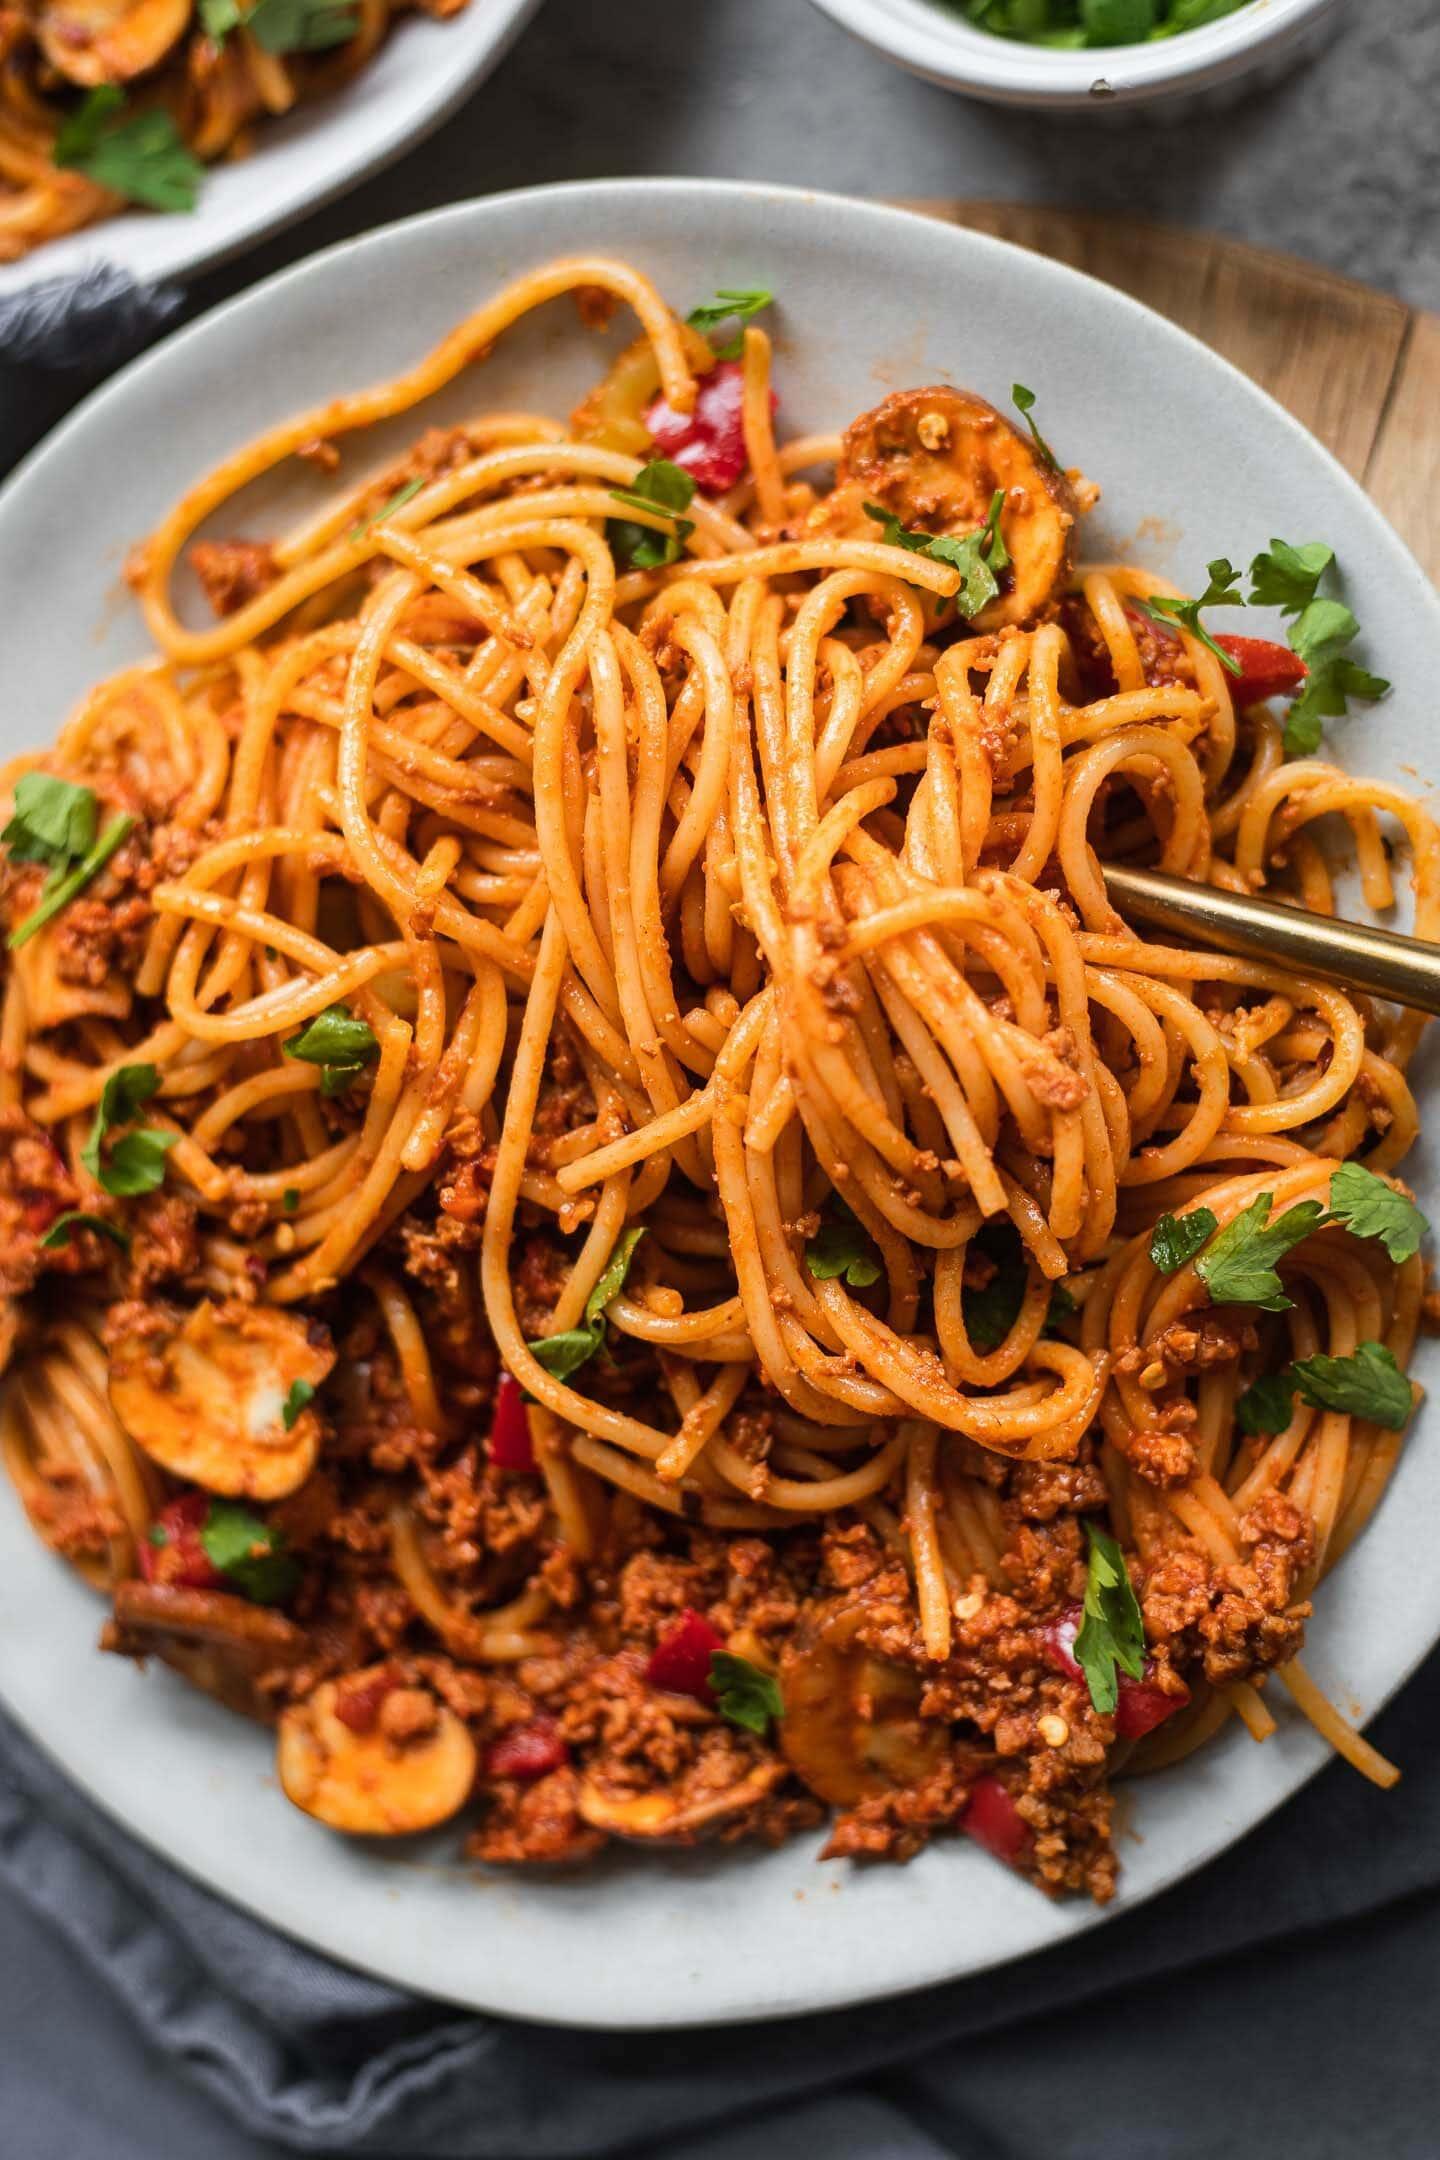 Vegan spaghetti dish with a tomato vegetable sauce